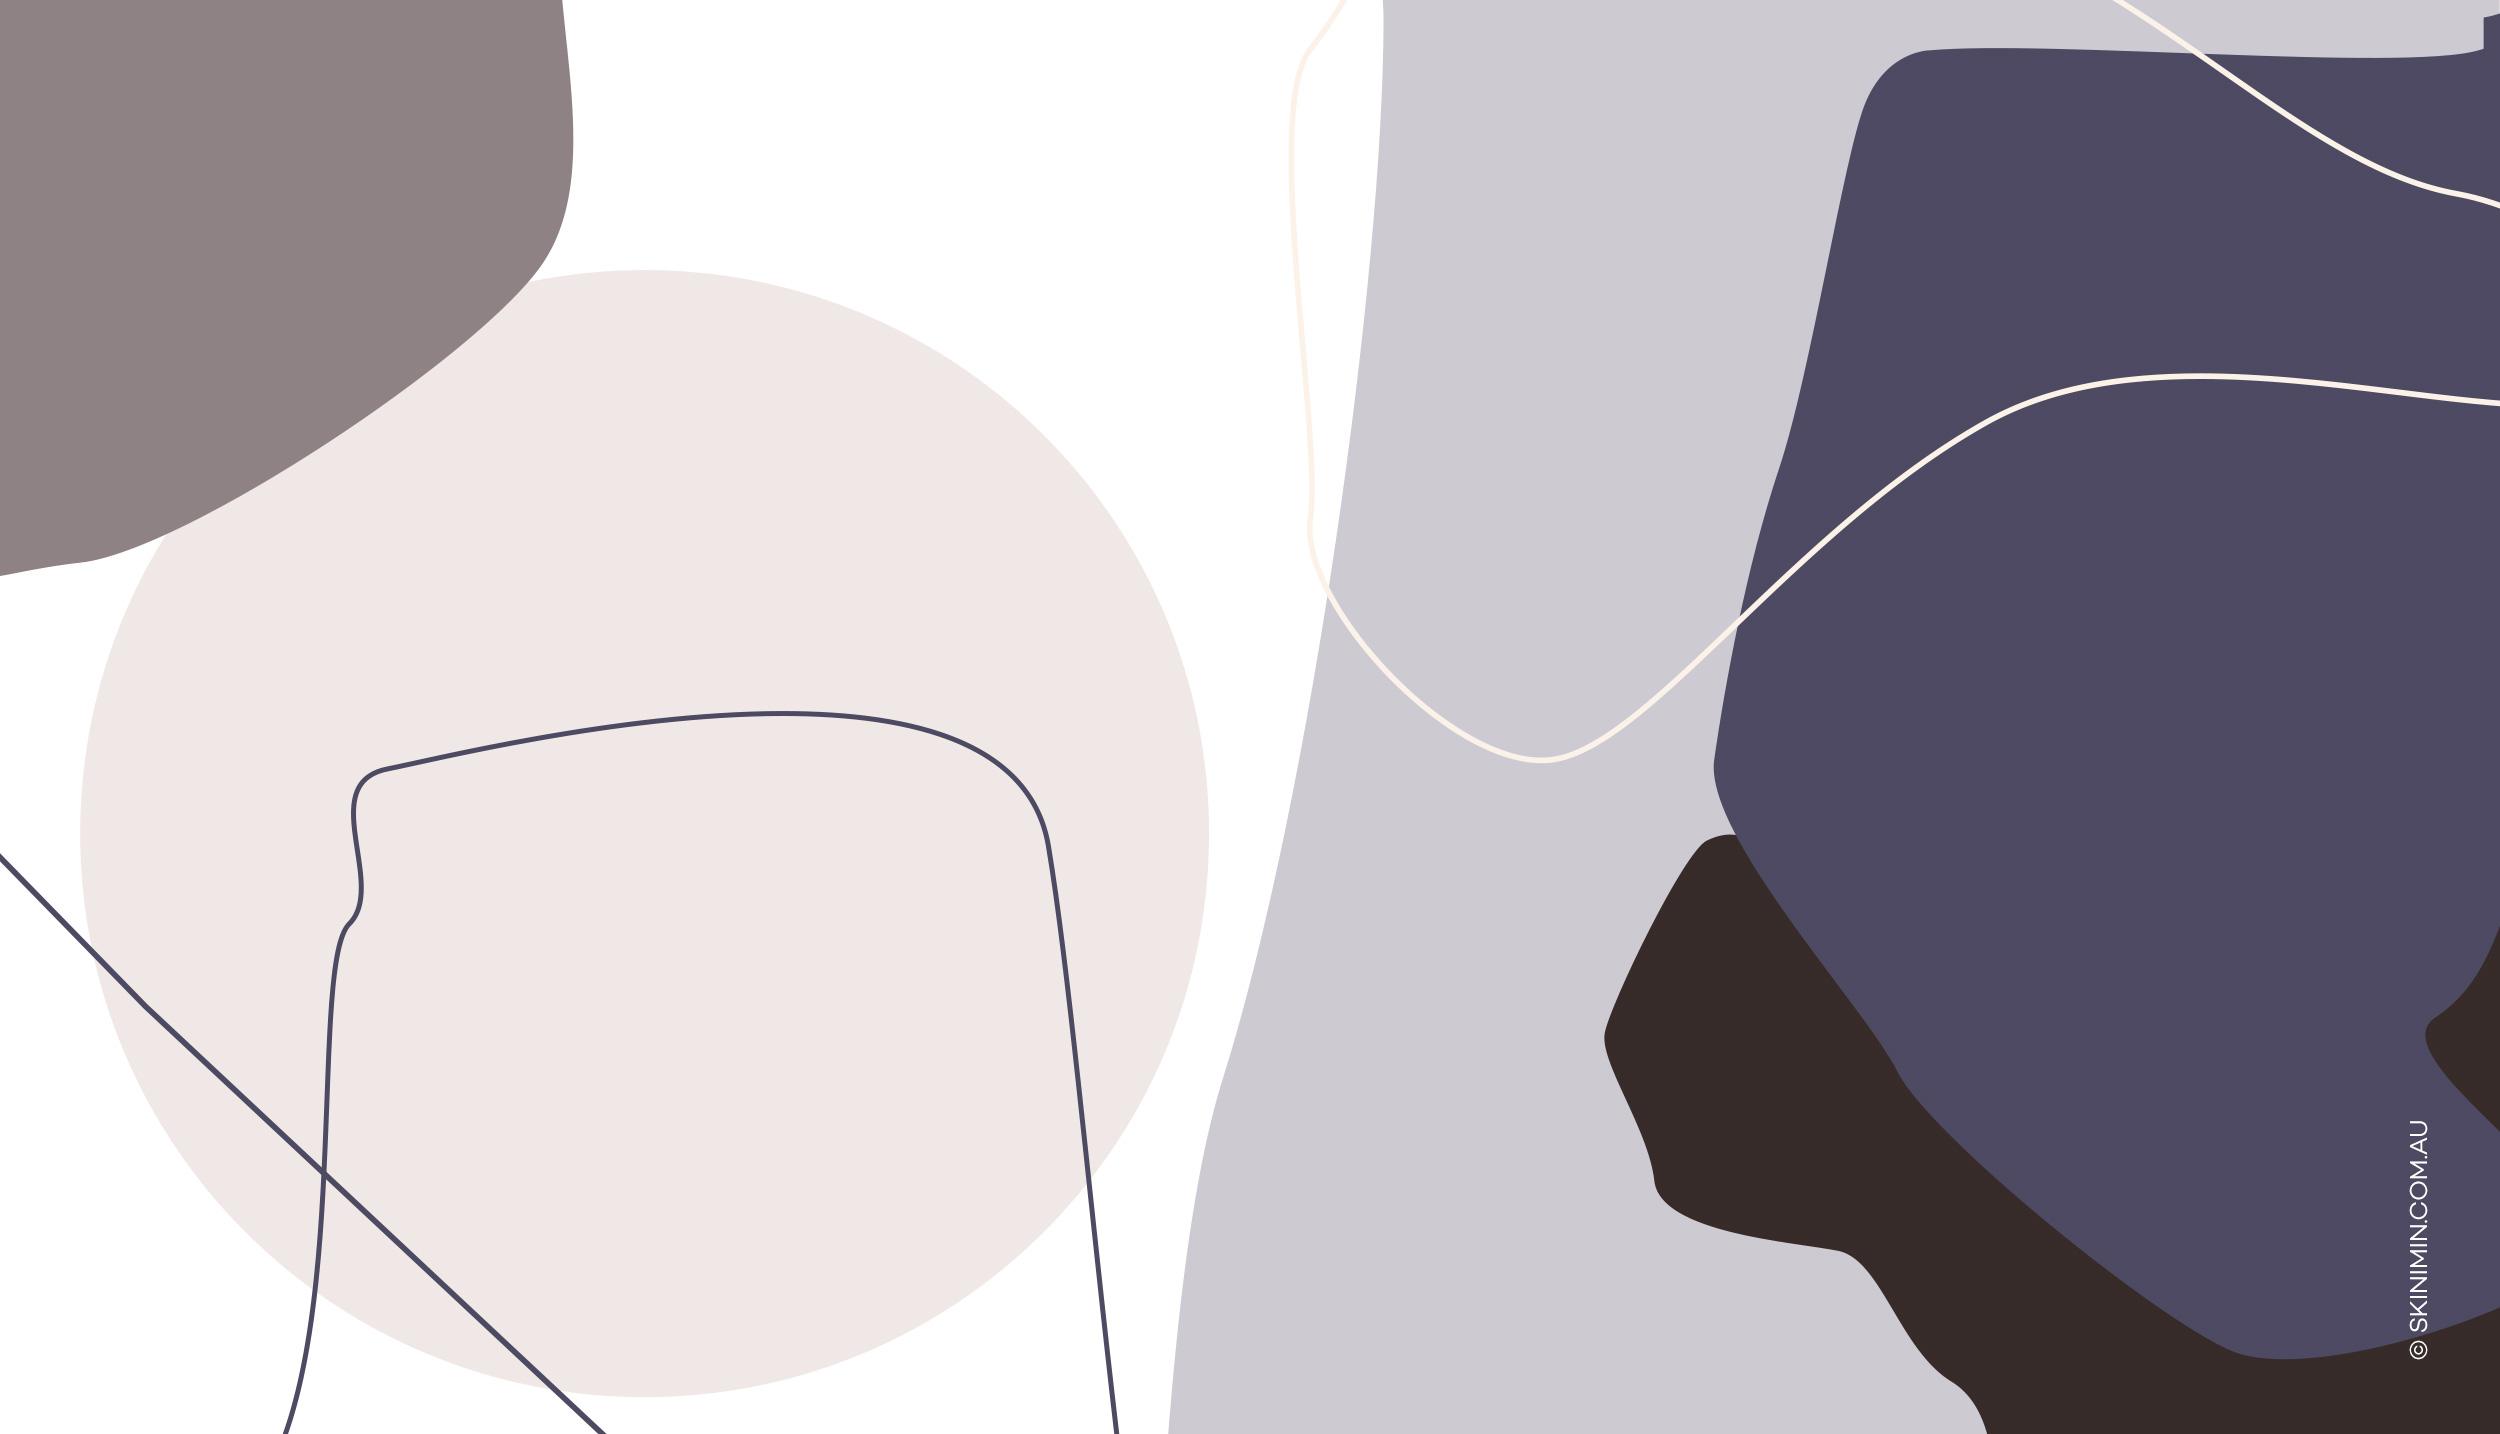 SkinImIn-gala-illustrationLight-2500x1667.jpg